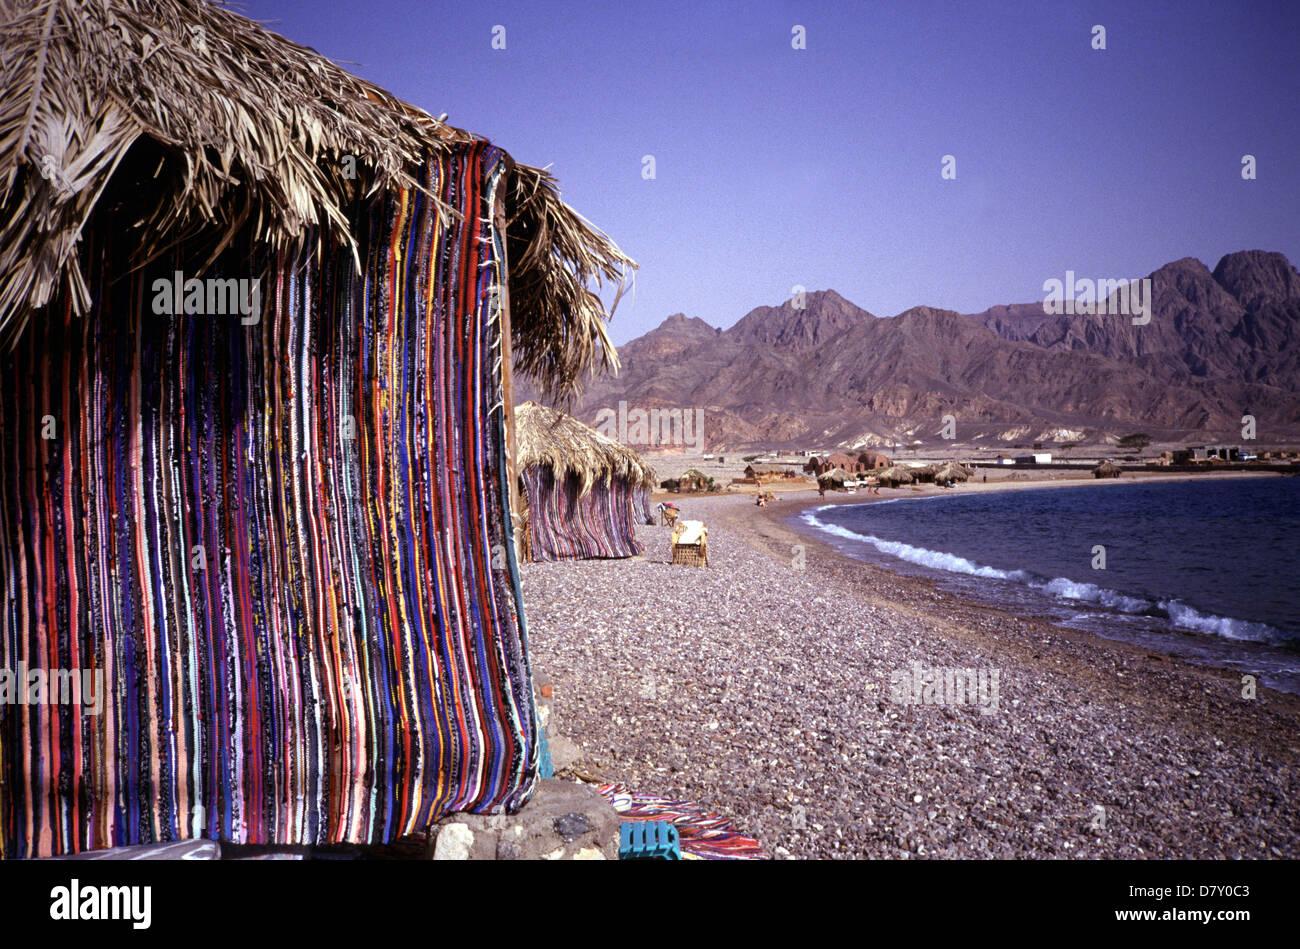 Bedouin style resort village in Ras el Satan beach resort near Nuweiba in the eastern part of Sinai Peninsula, Red - Stock Image